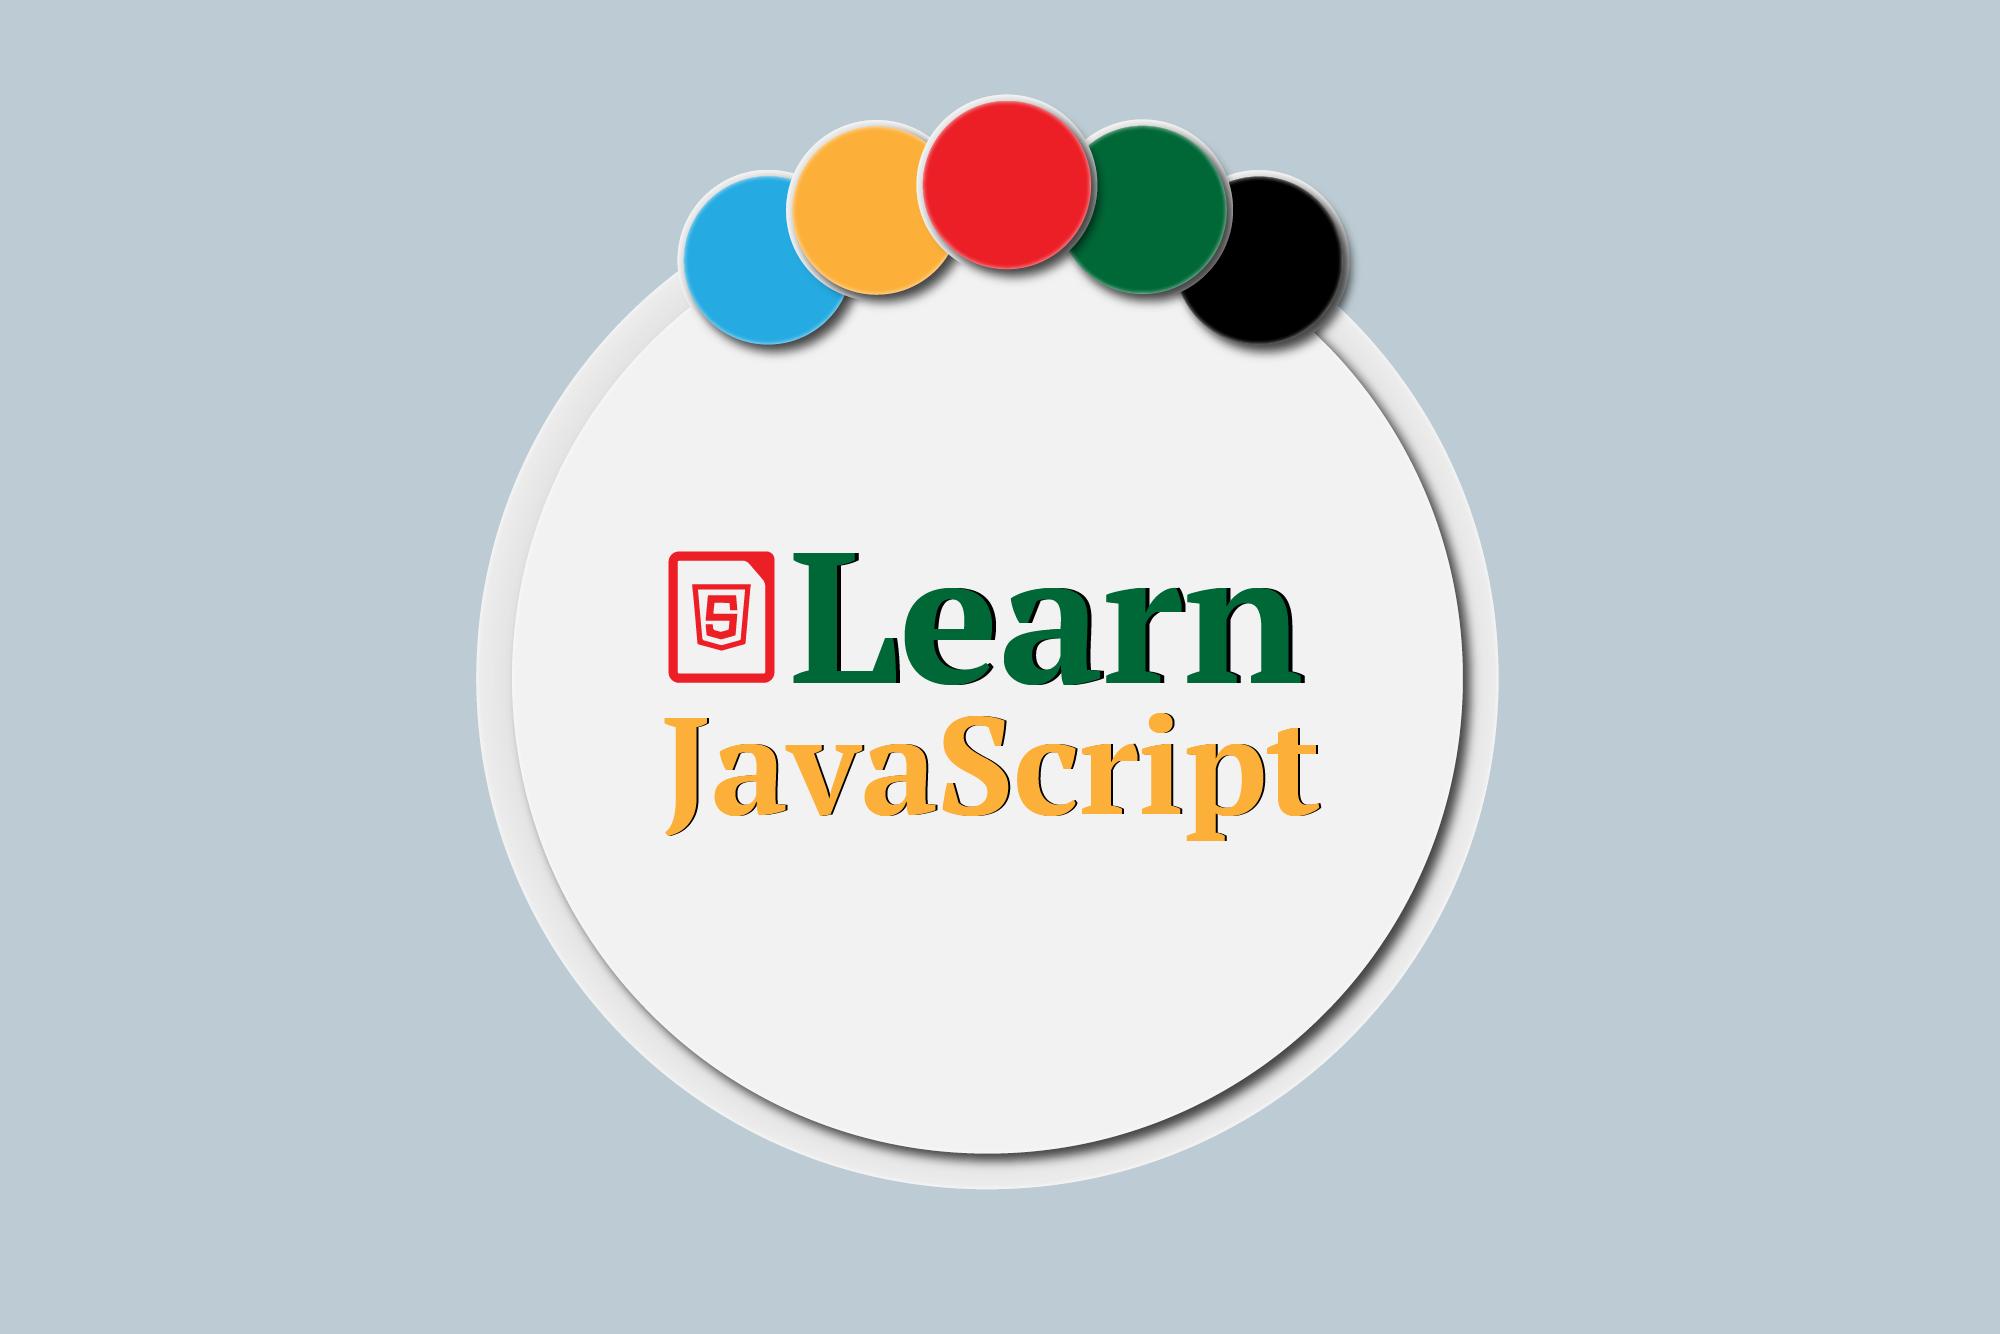 https://digitalstudyroom.com/storage/upload/courses/96/96.png